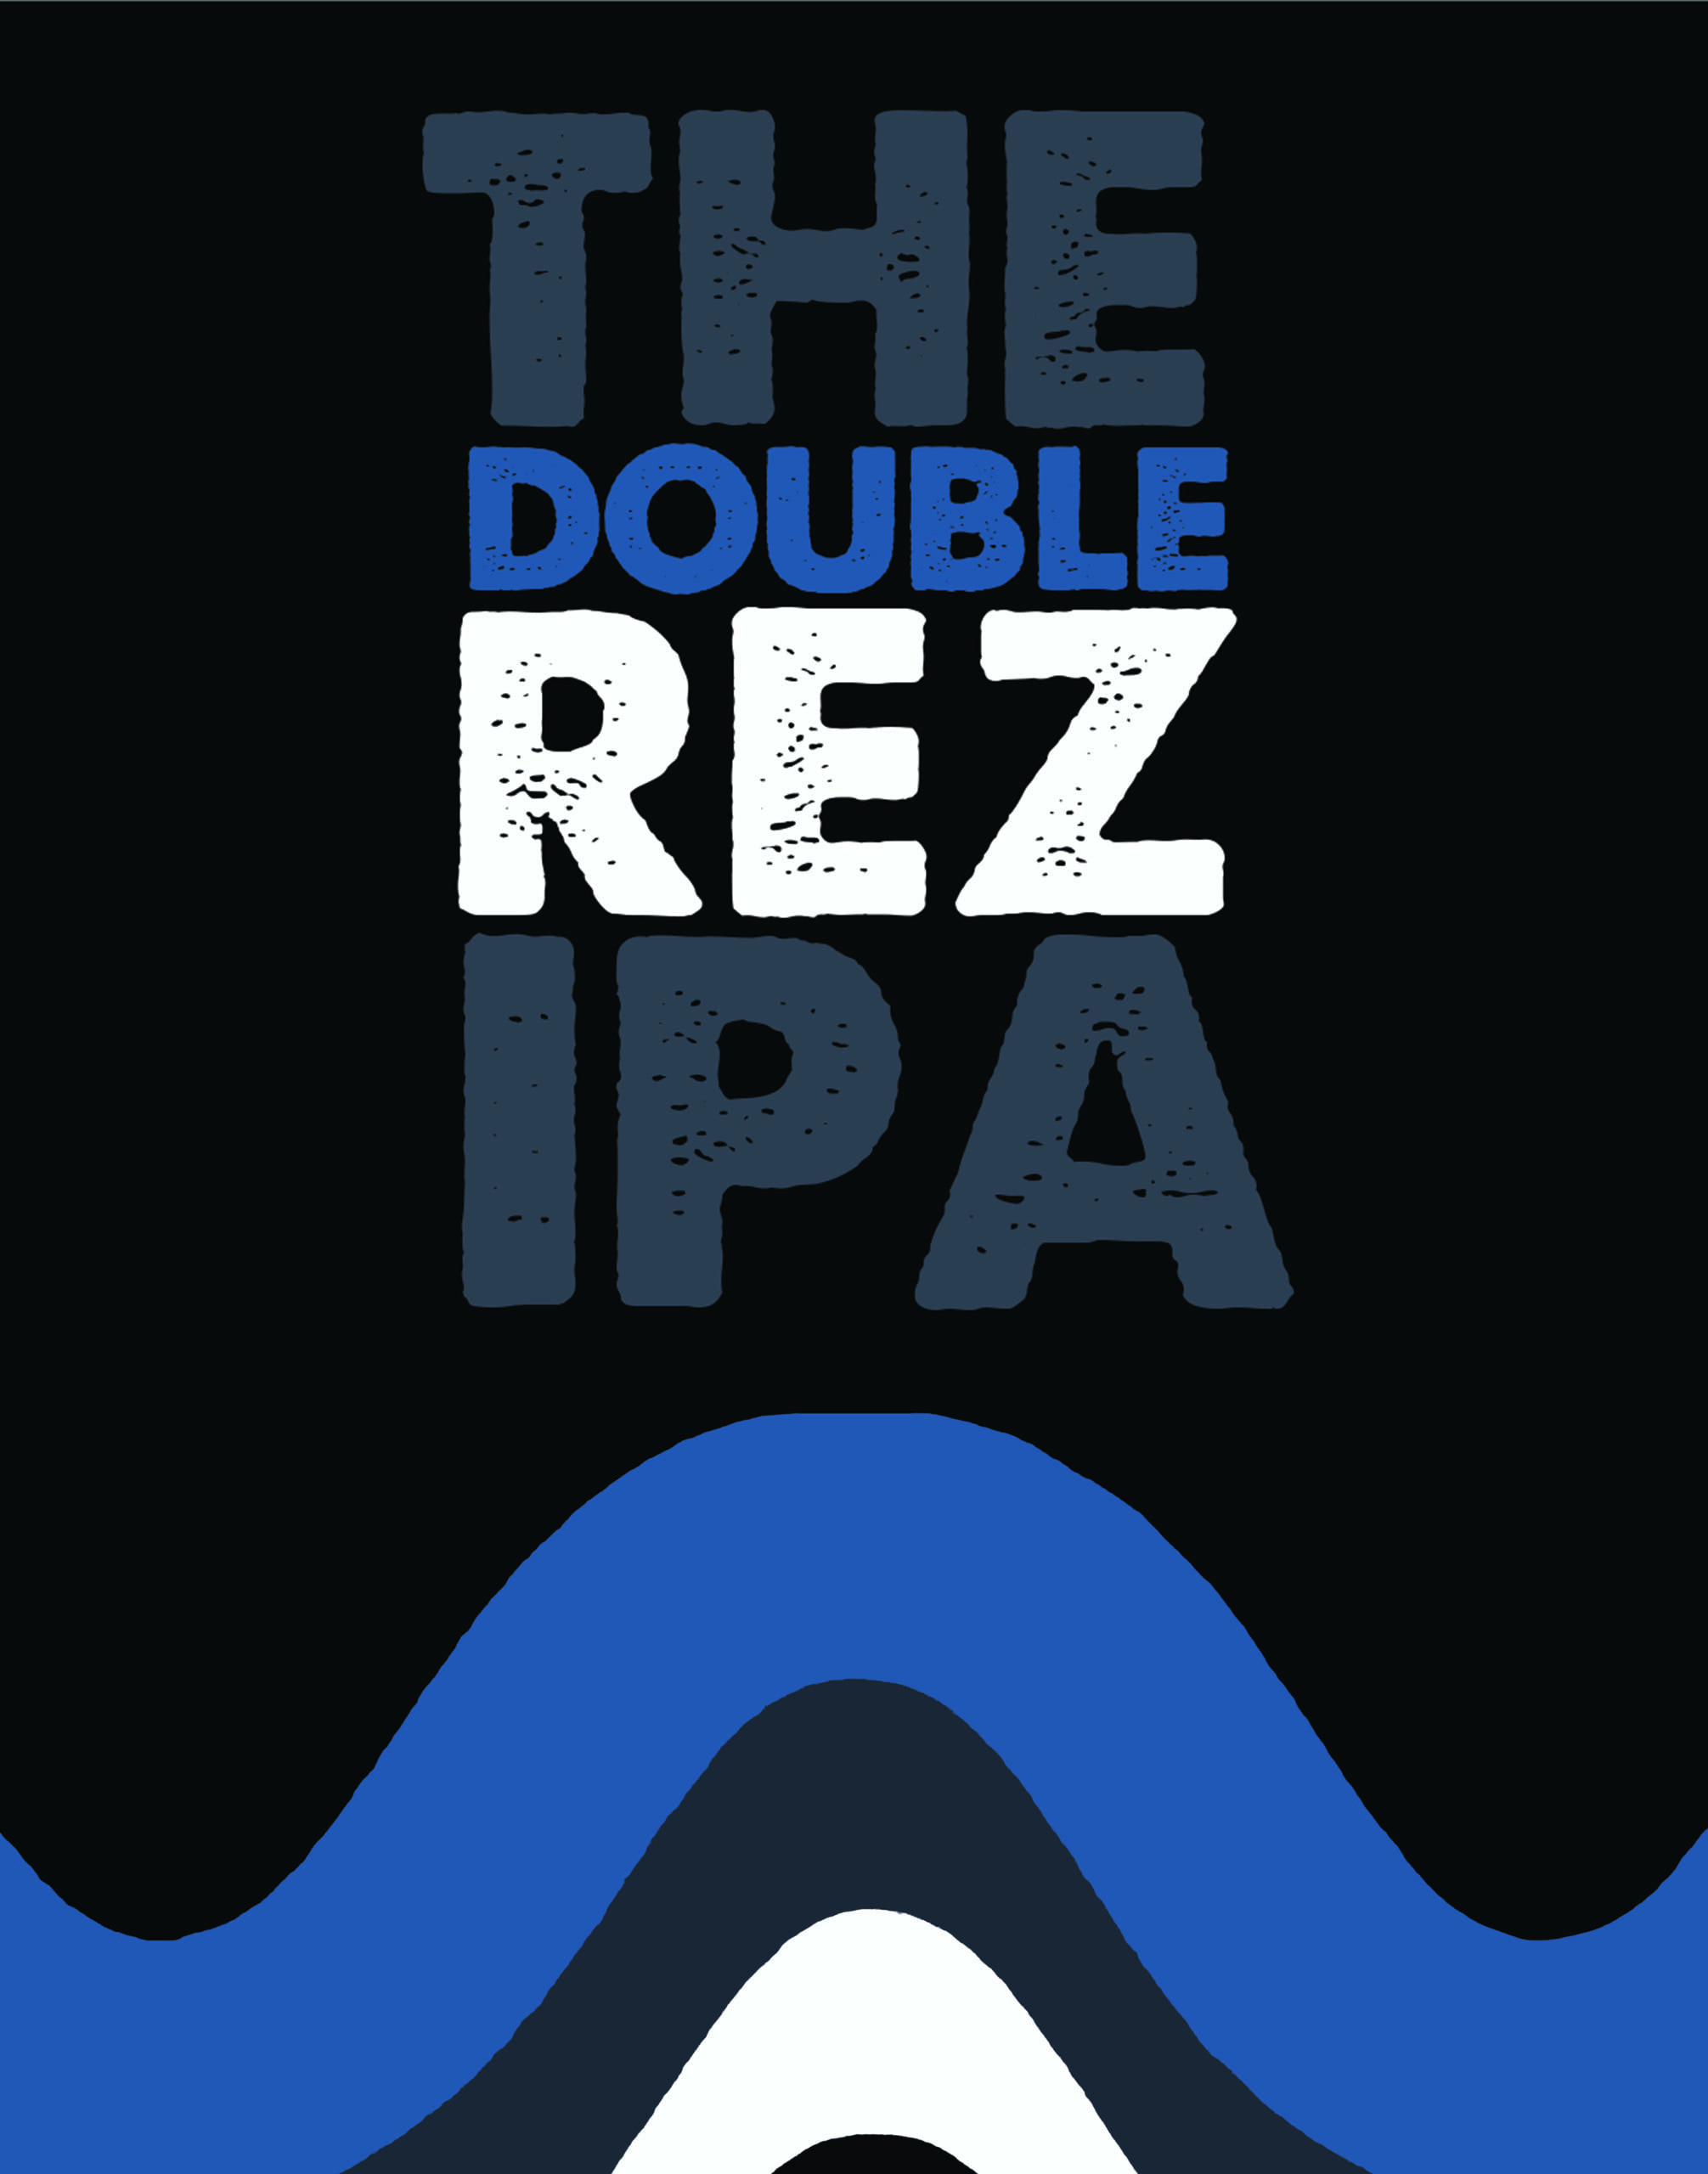 Double Rez